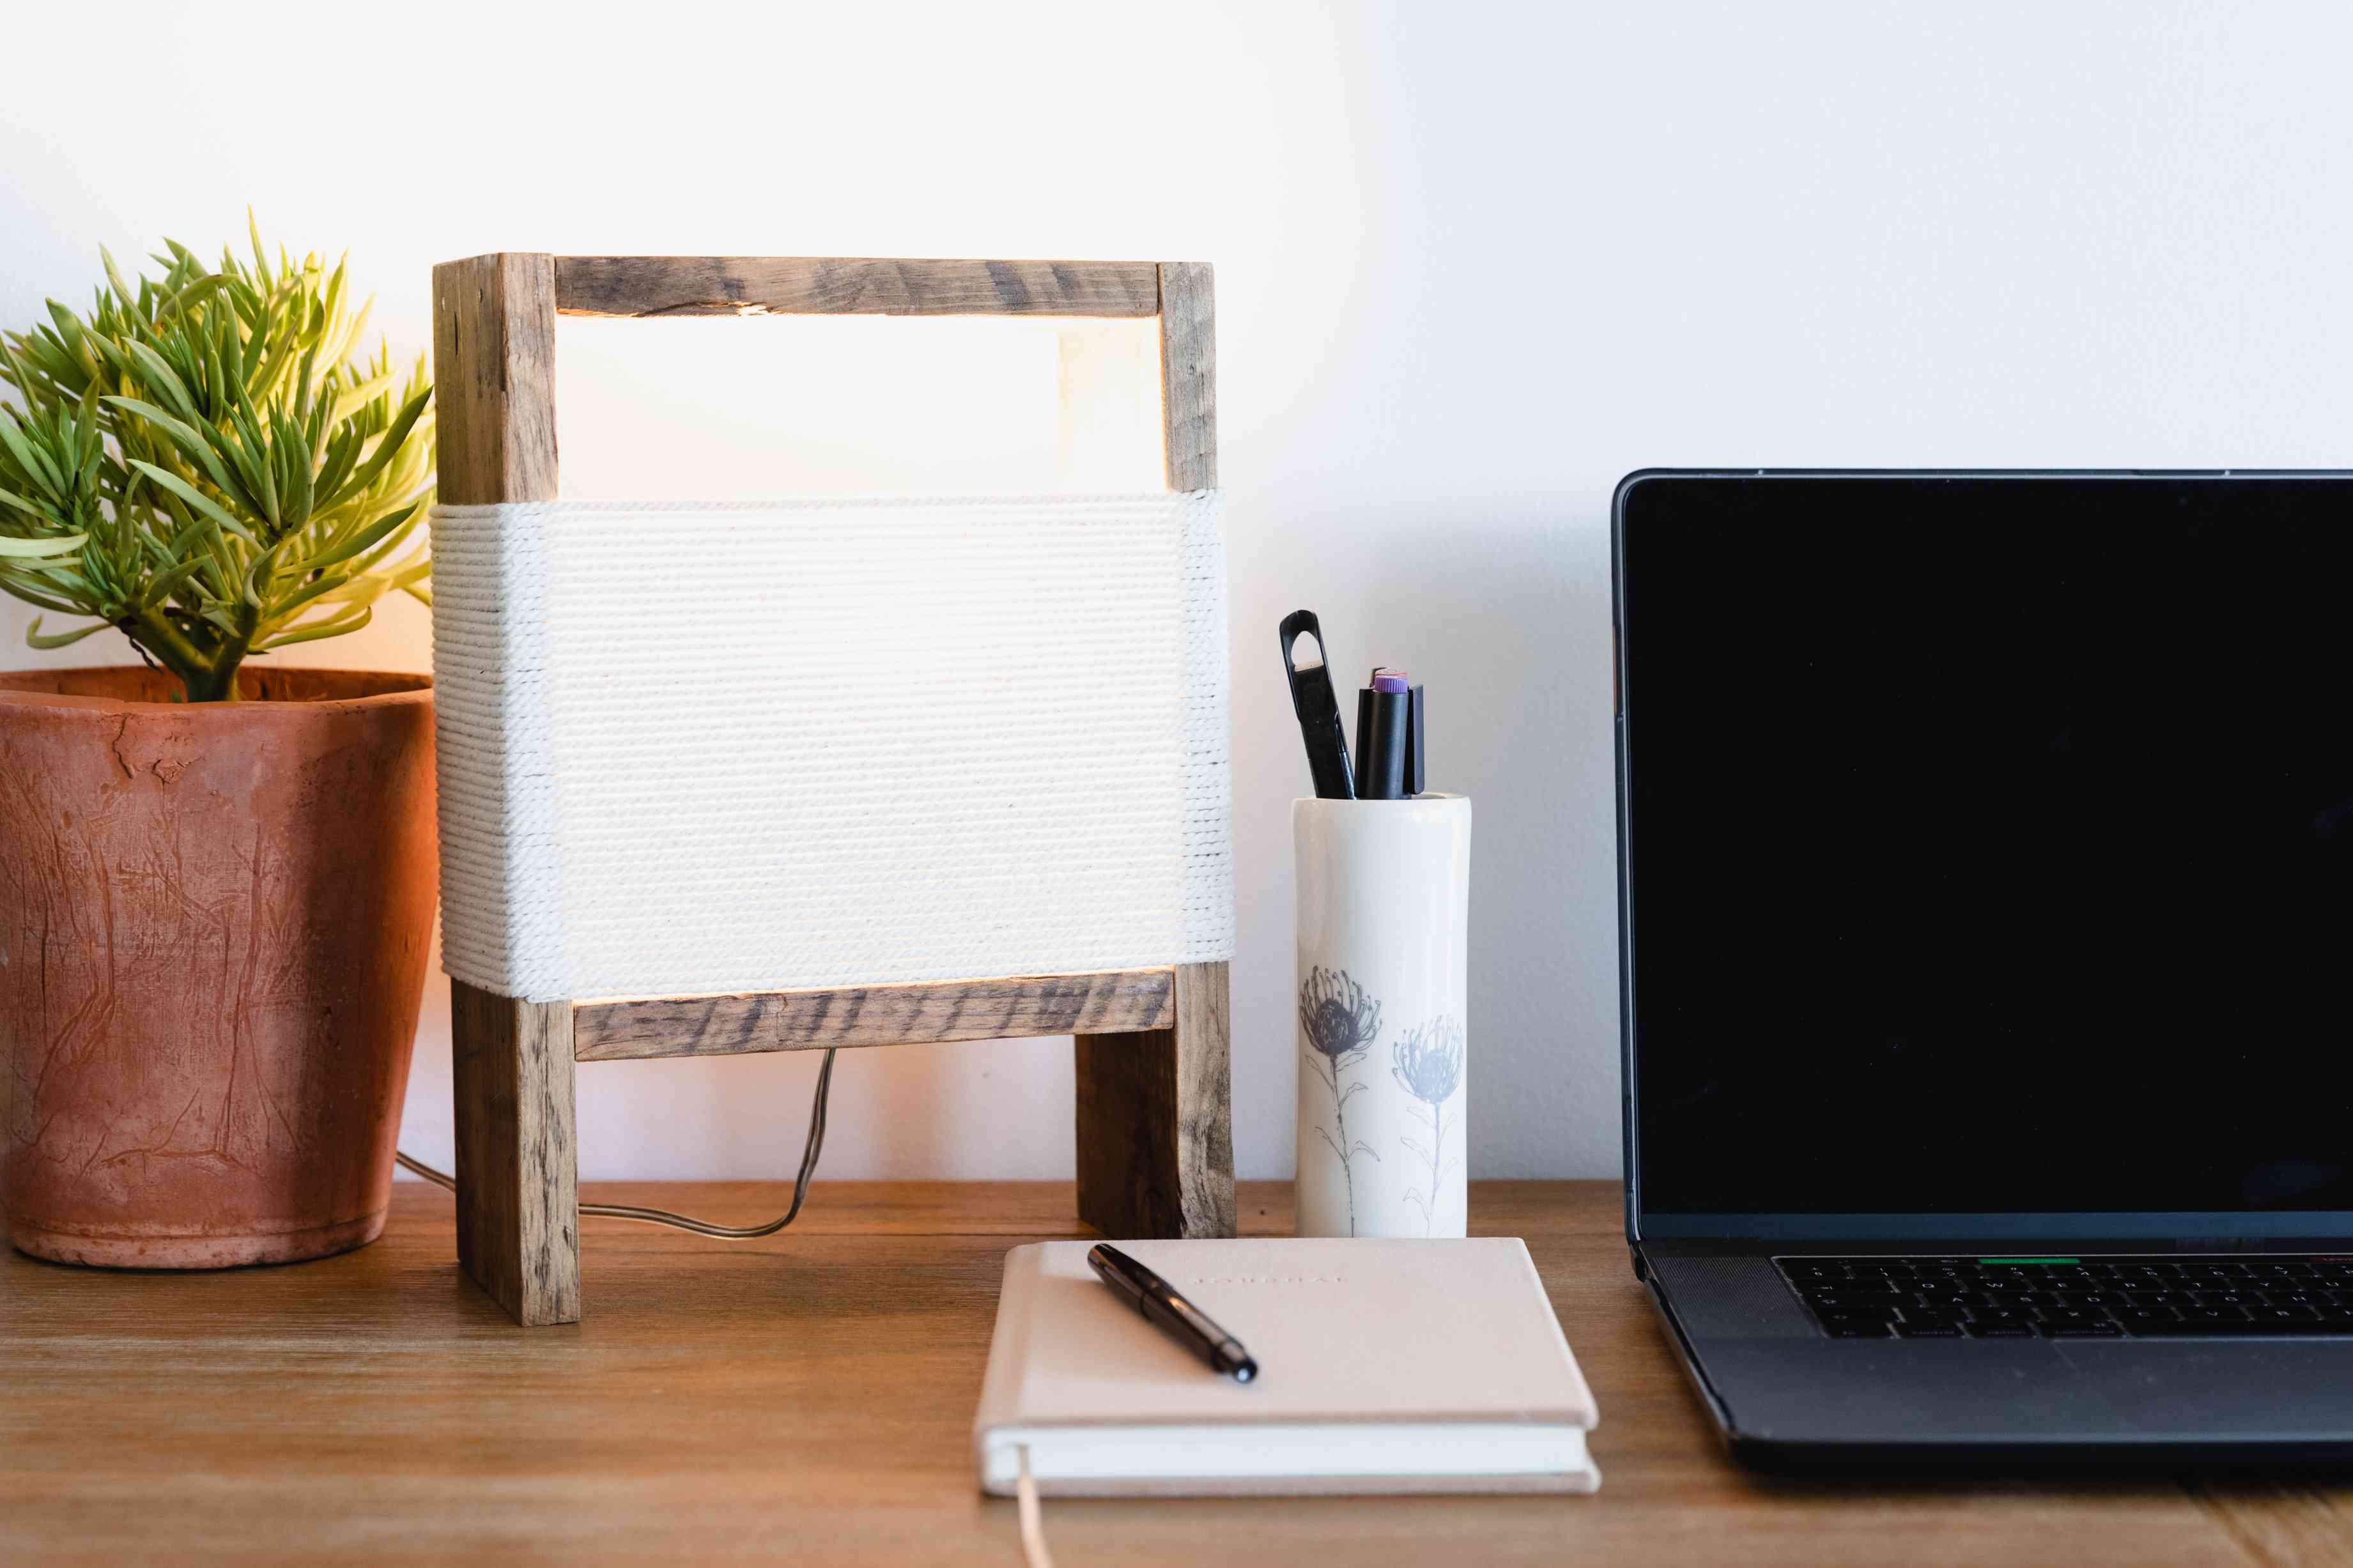 decorative office lamp